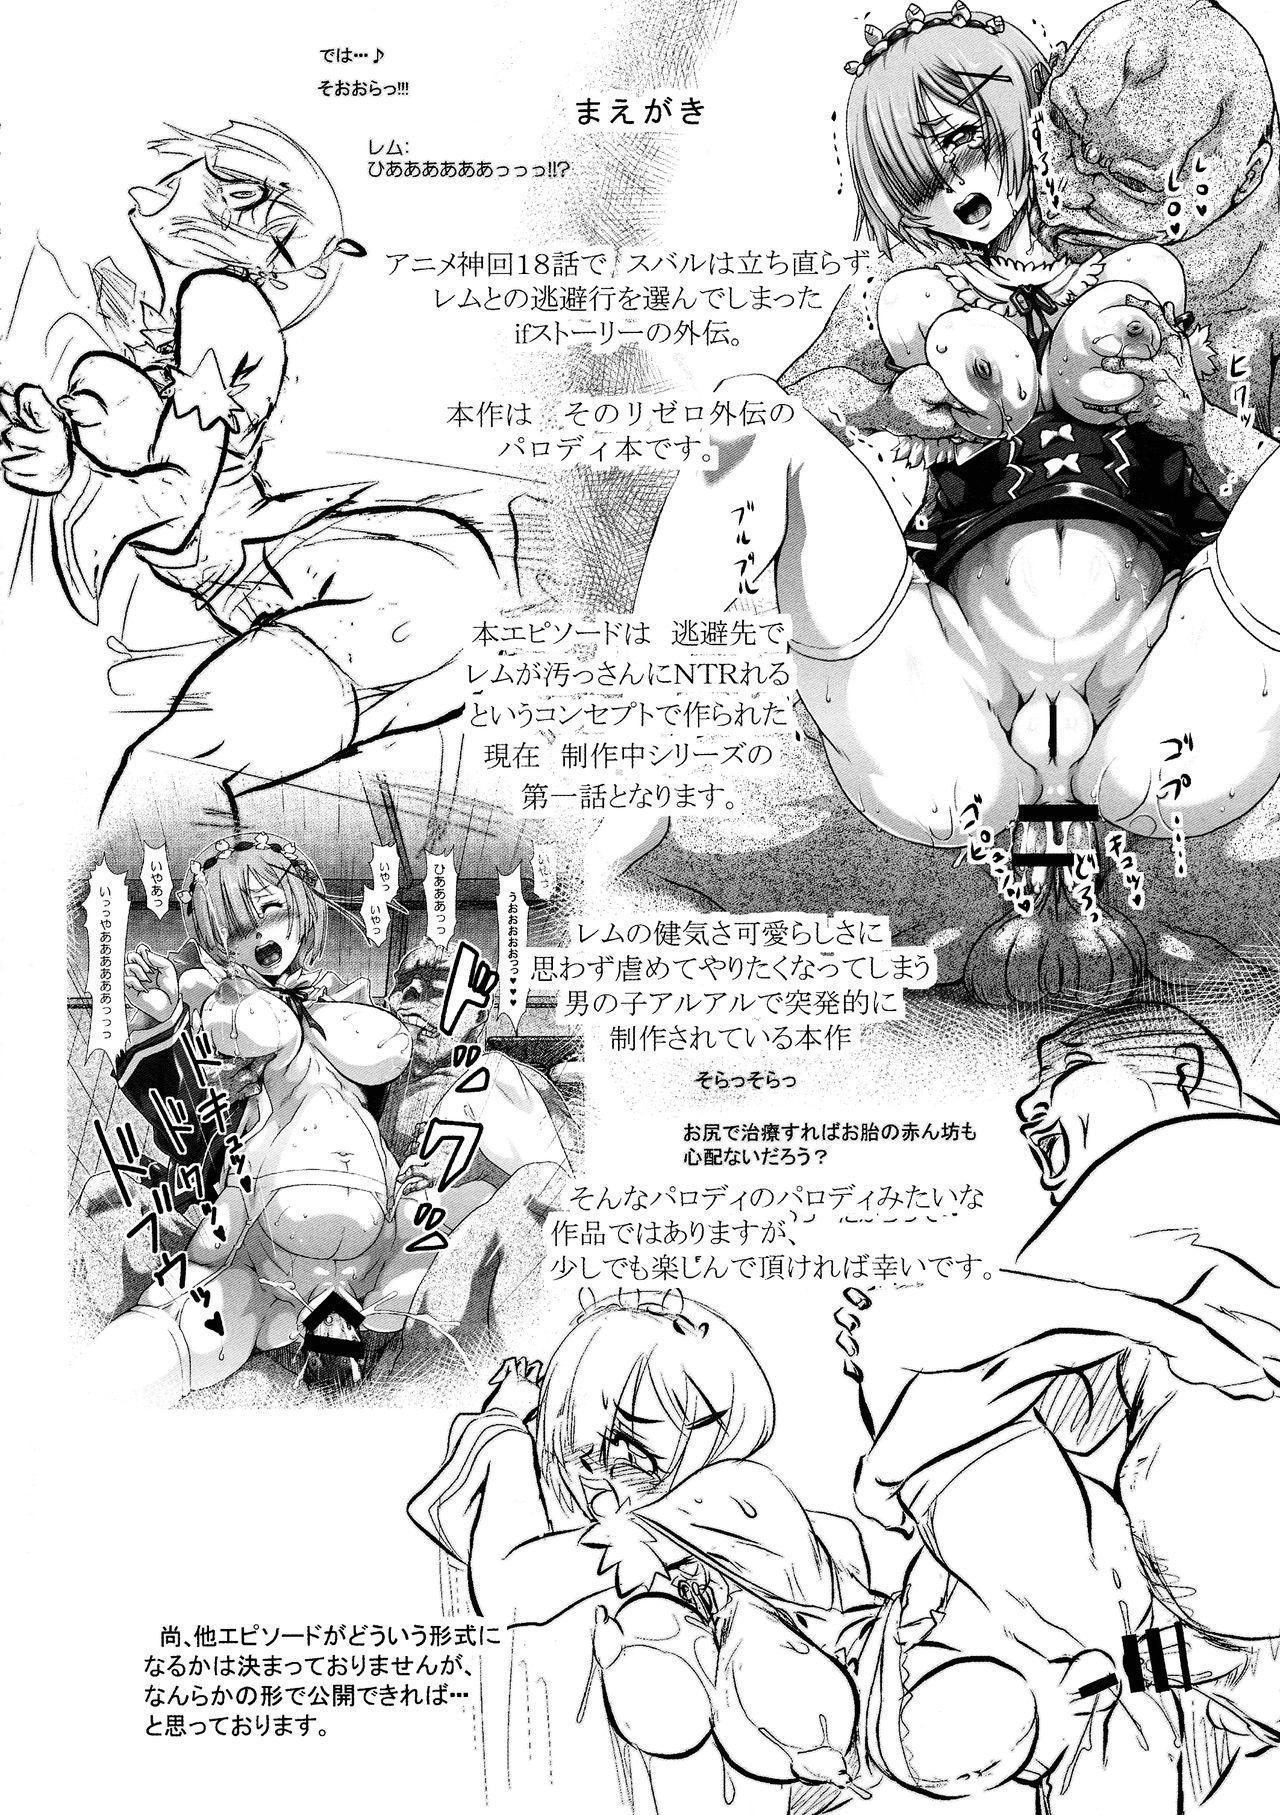 Rem:Danshou Natsuki Rem no Eromanga 2